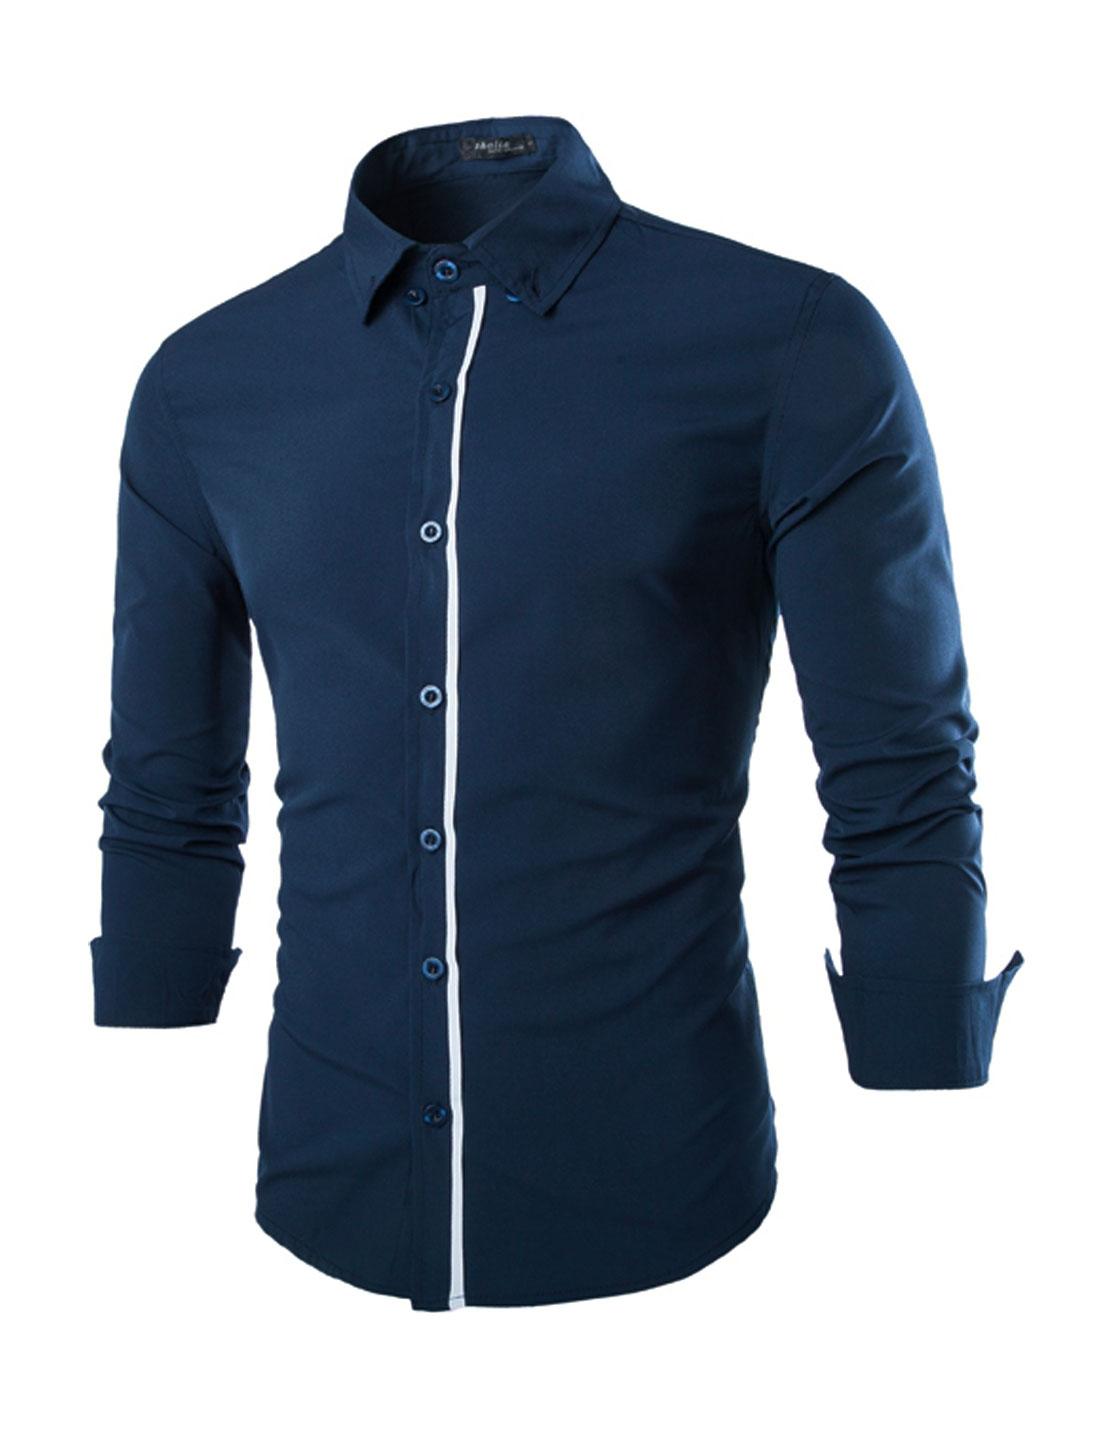 Men Long Sleeve Point Collar Slim Fit Leisure Shirt Navy Blue M